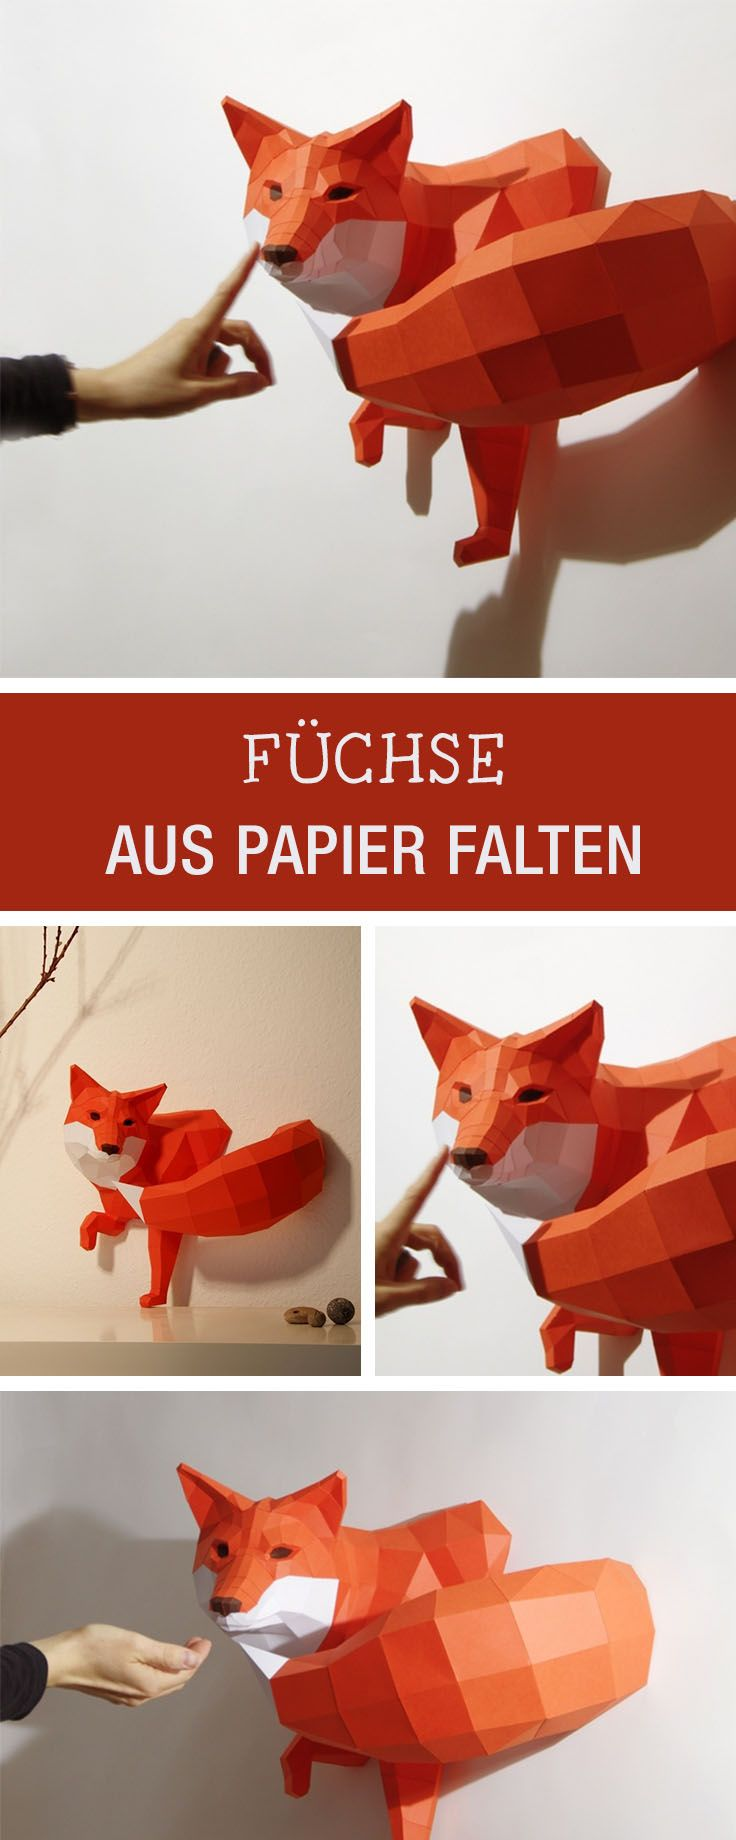 diy f r einen origami fuchs als originelle wohndeko craft an origami fox made of paper home decor via dawanda com [ 736 x 1840 Pixel ]